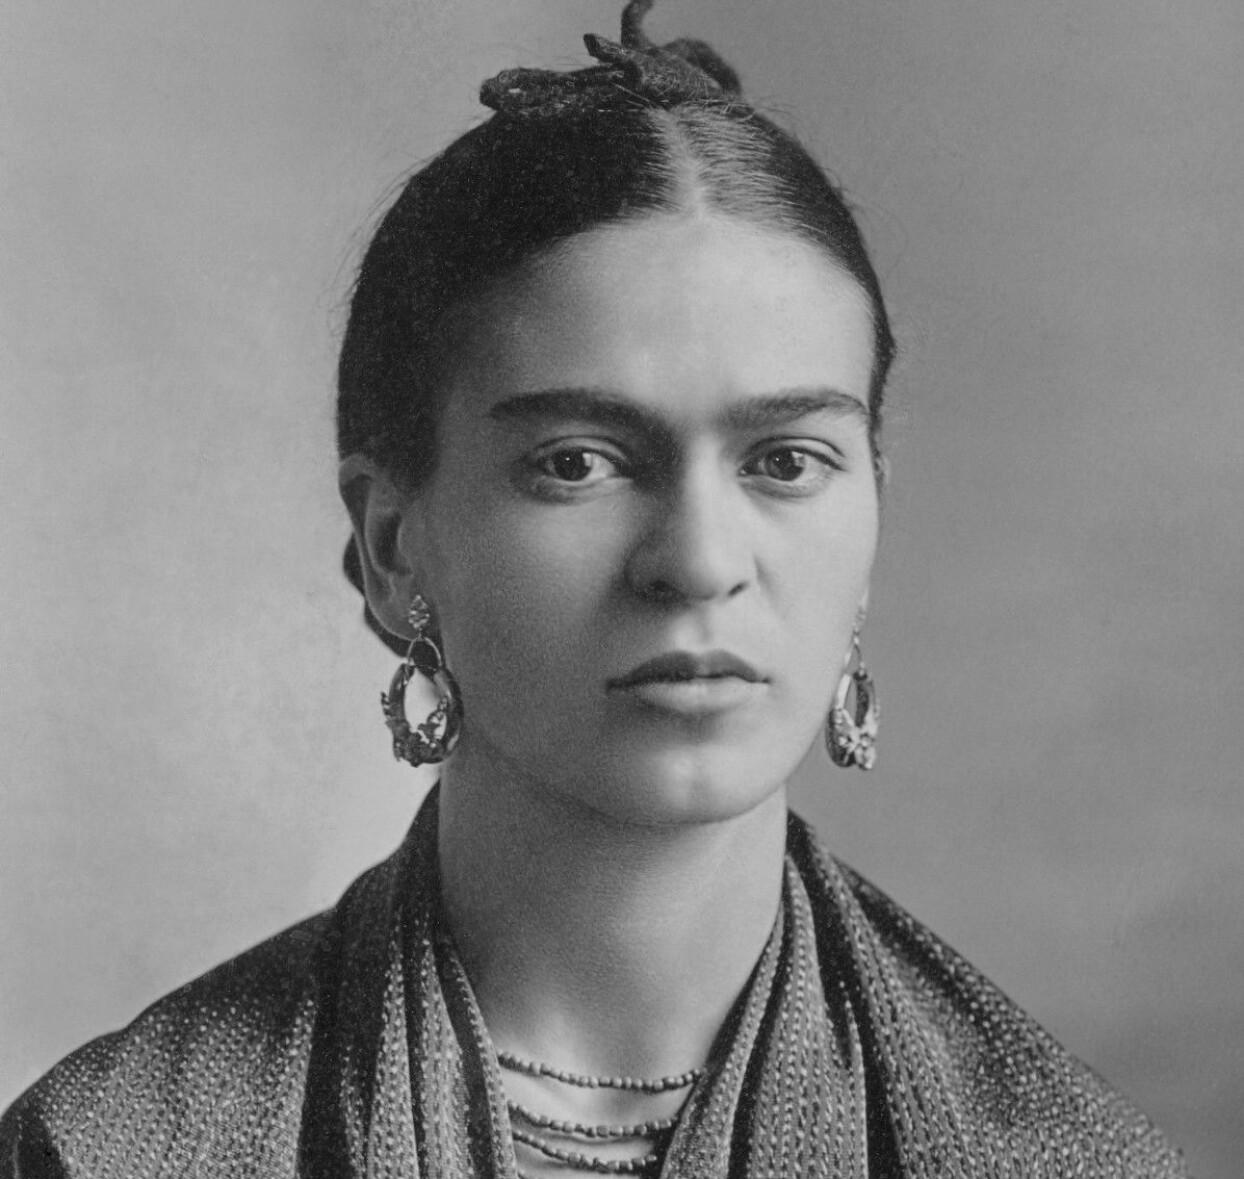 Klassiskt fotografi av Frida Kahlo.